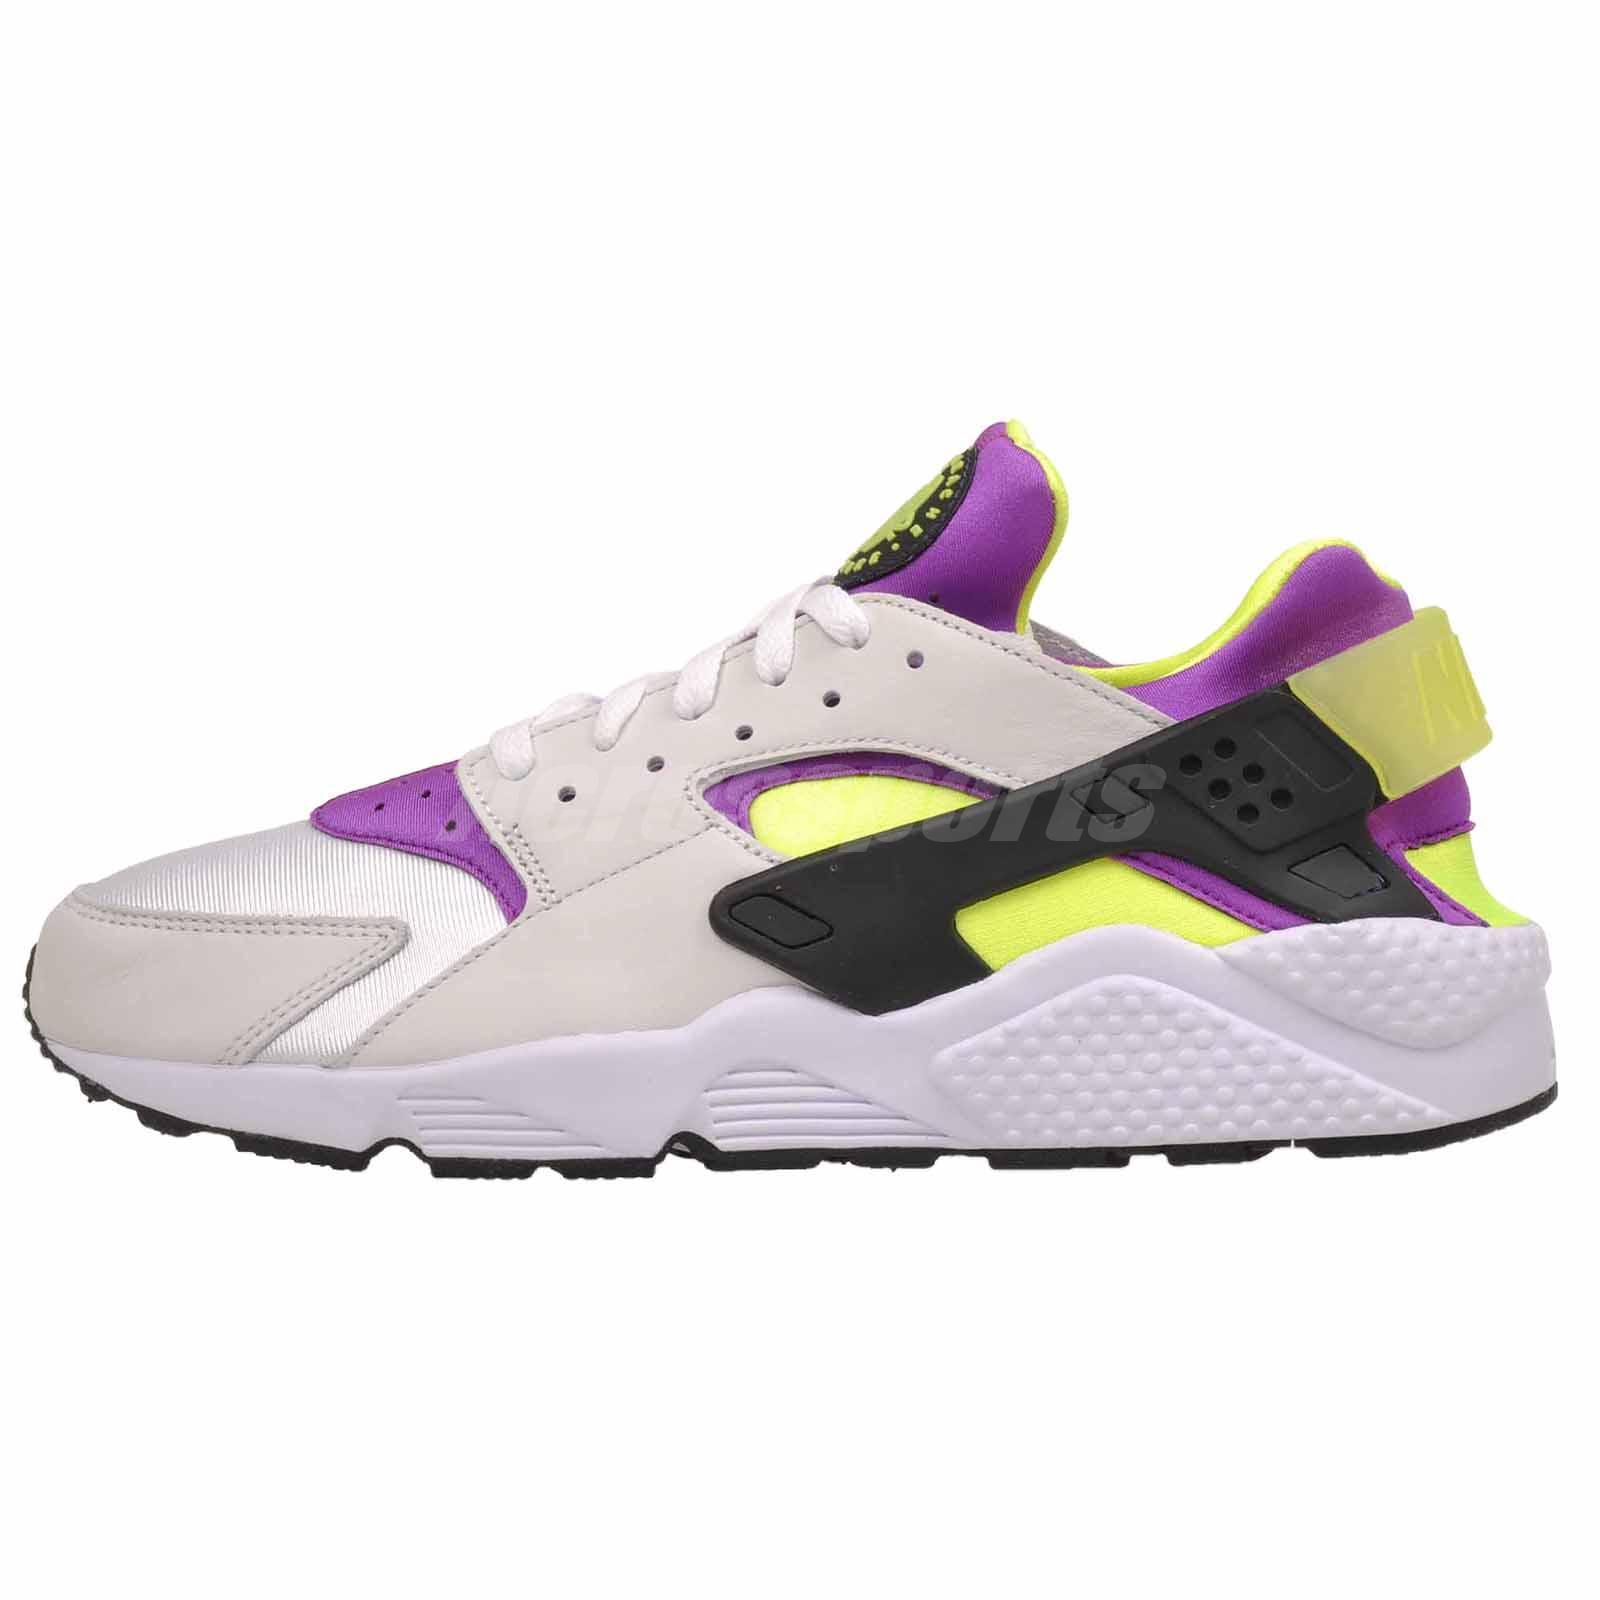 website for discount size 7 buy best Nike Air Huarache Run 91 QS Running Mens Womens Shoes White Yellow ...